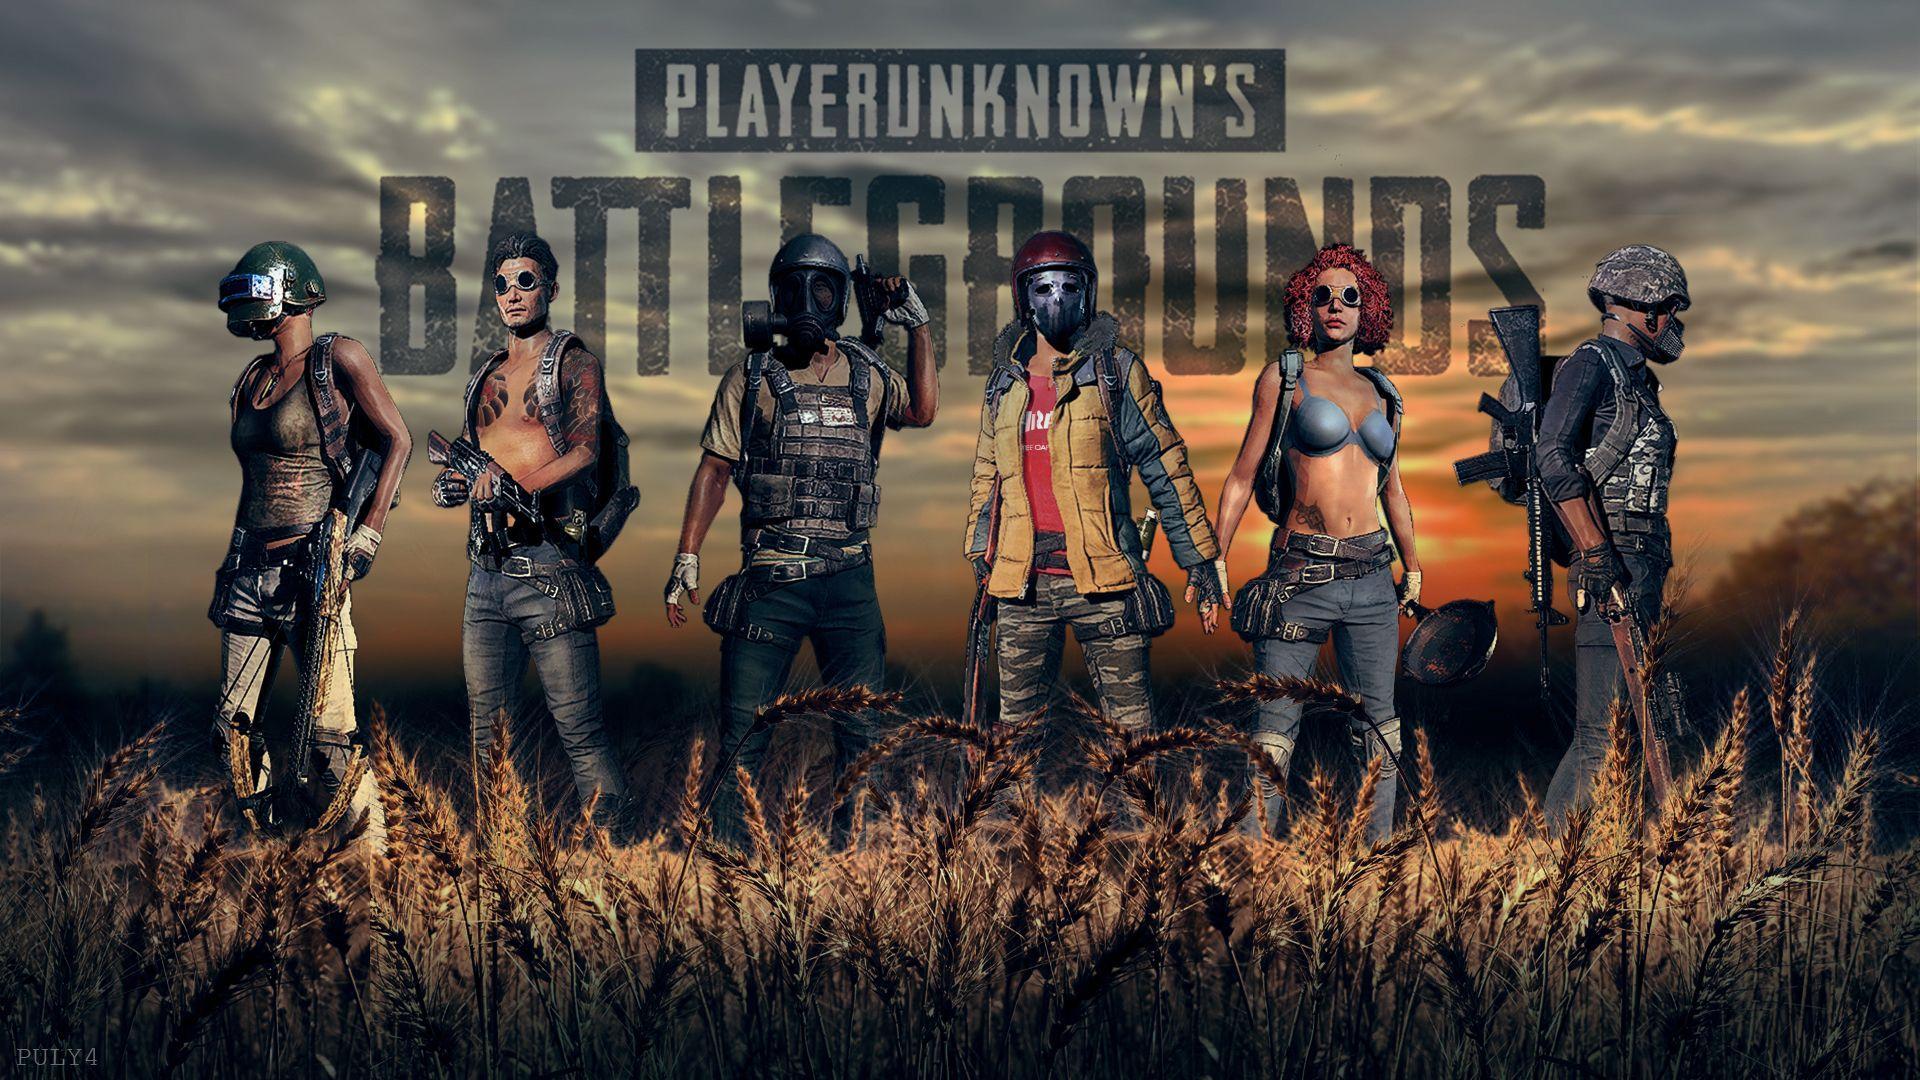 3840x2160 PlayerUnknownu0027s Battlegrounds ...